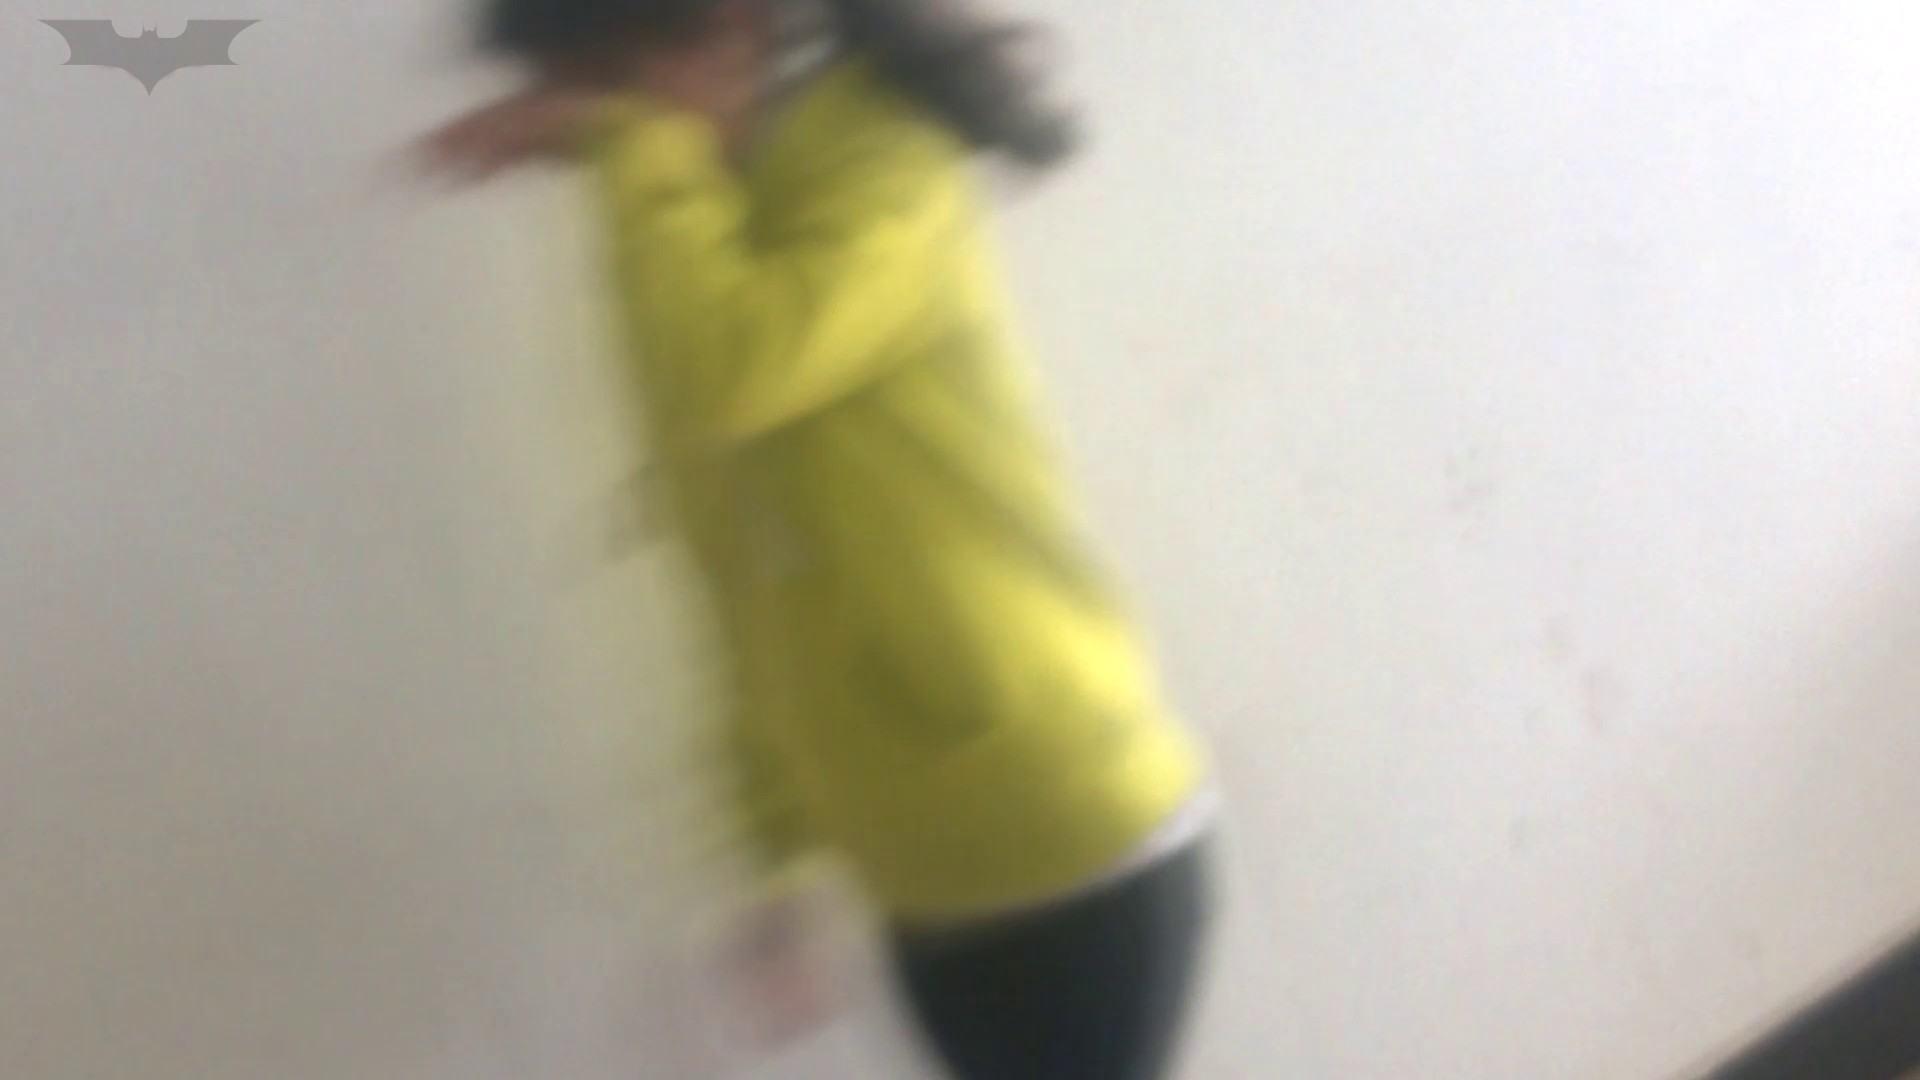 JD盗撮 美女の洗面所の秘密 Vol.02 トイレのぞき おまんこ無修正動画無料 60画像 58